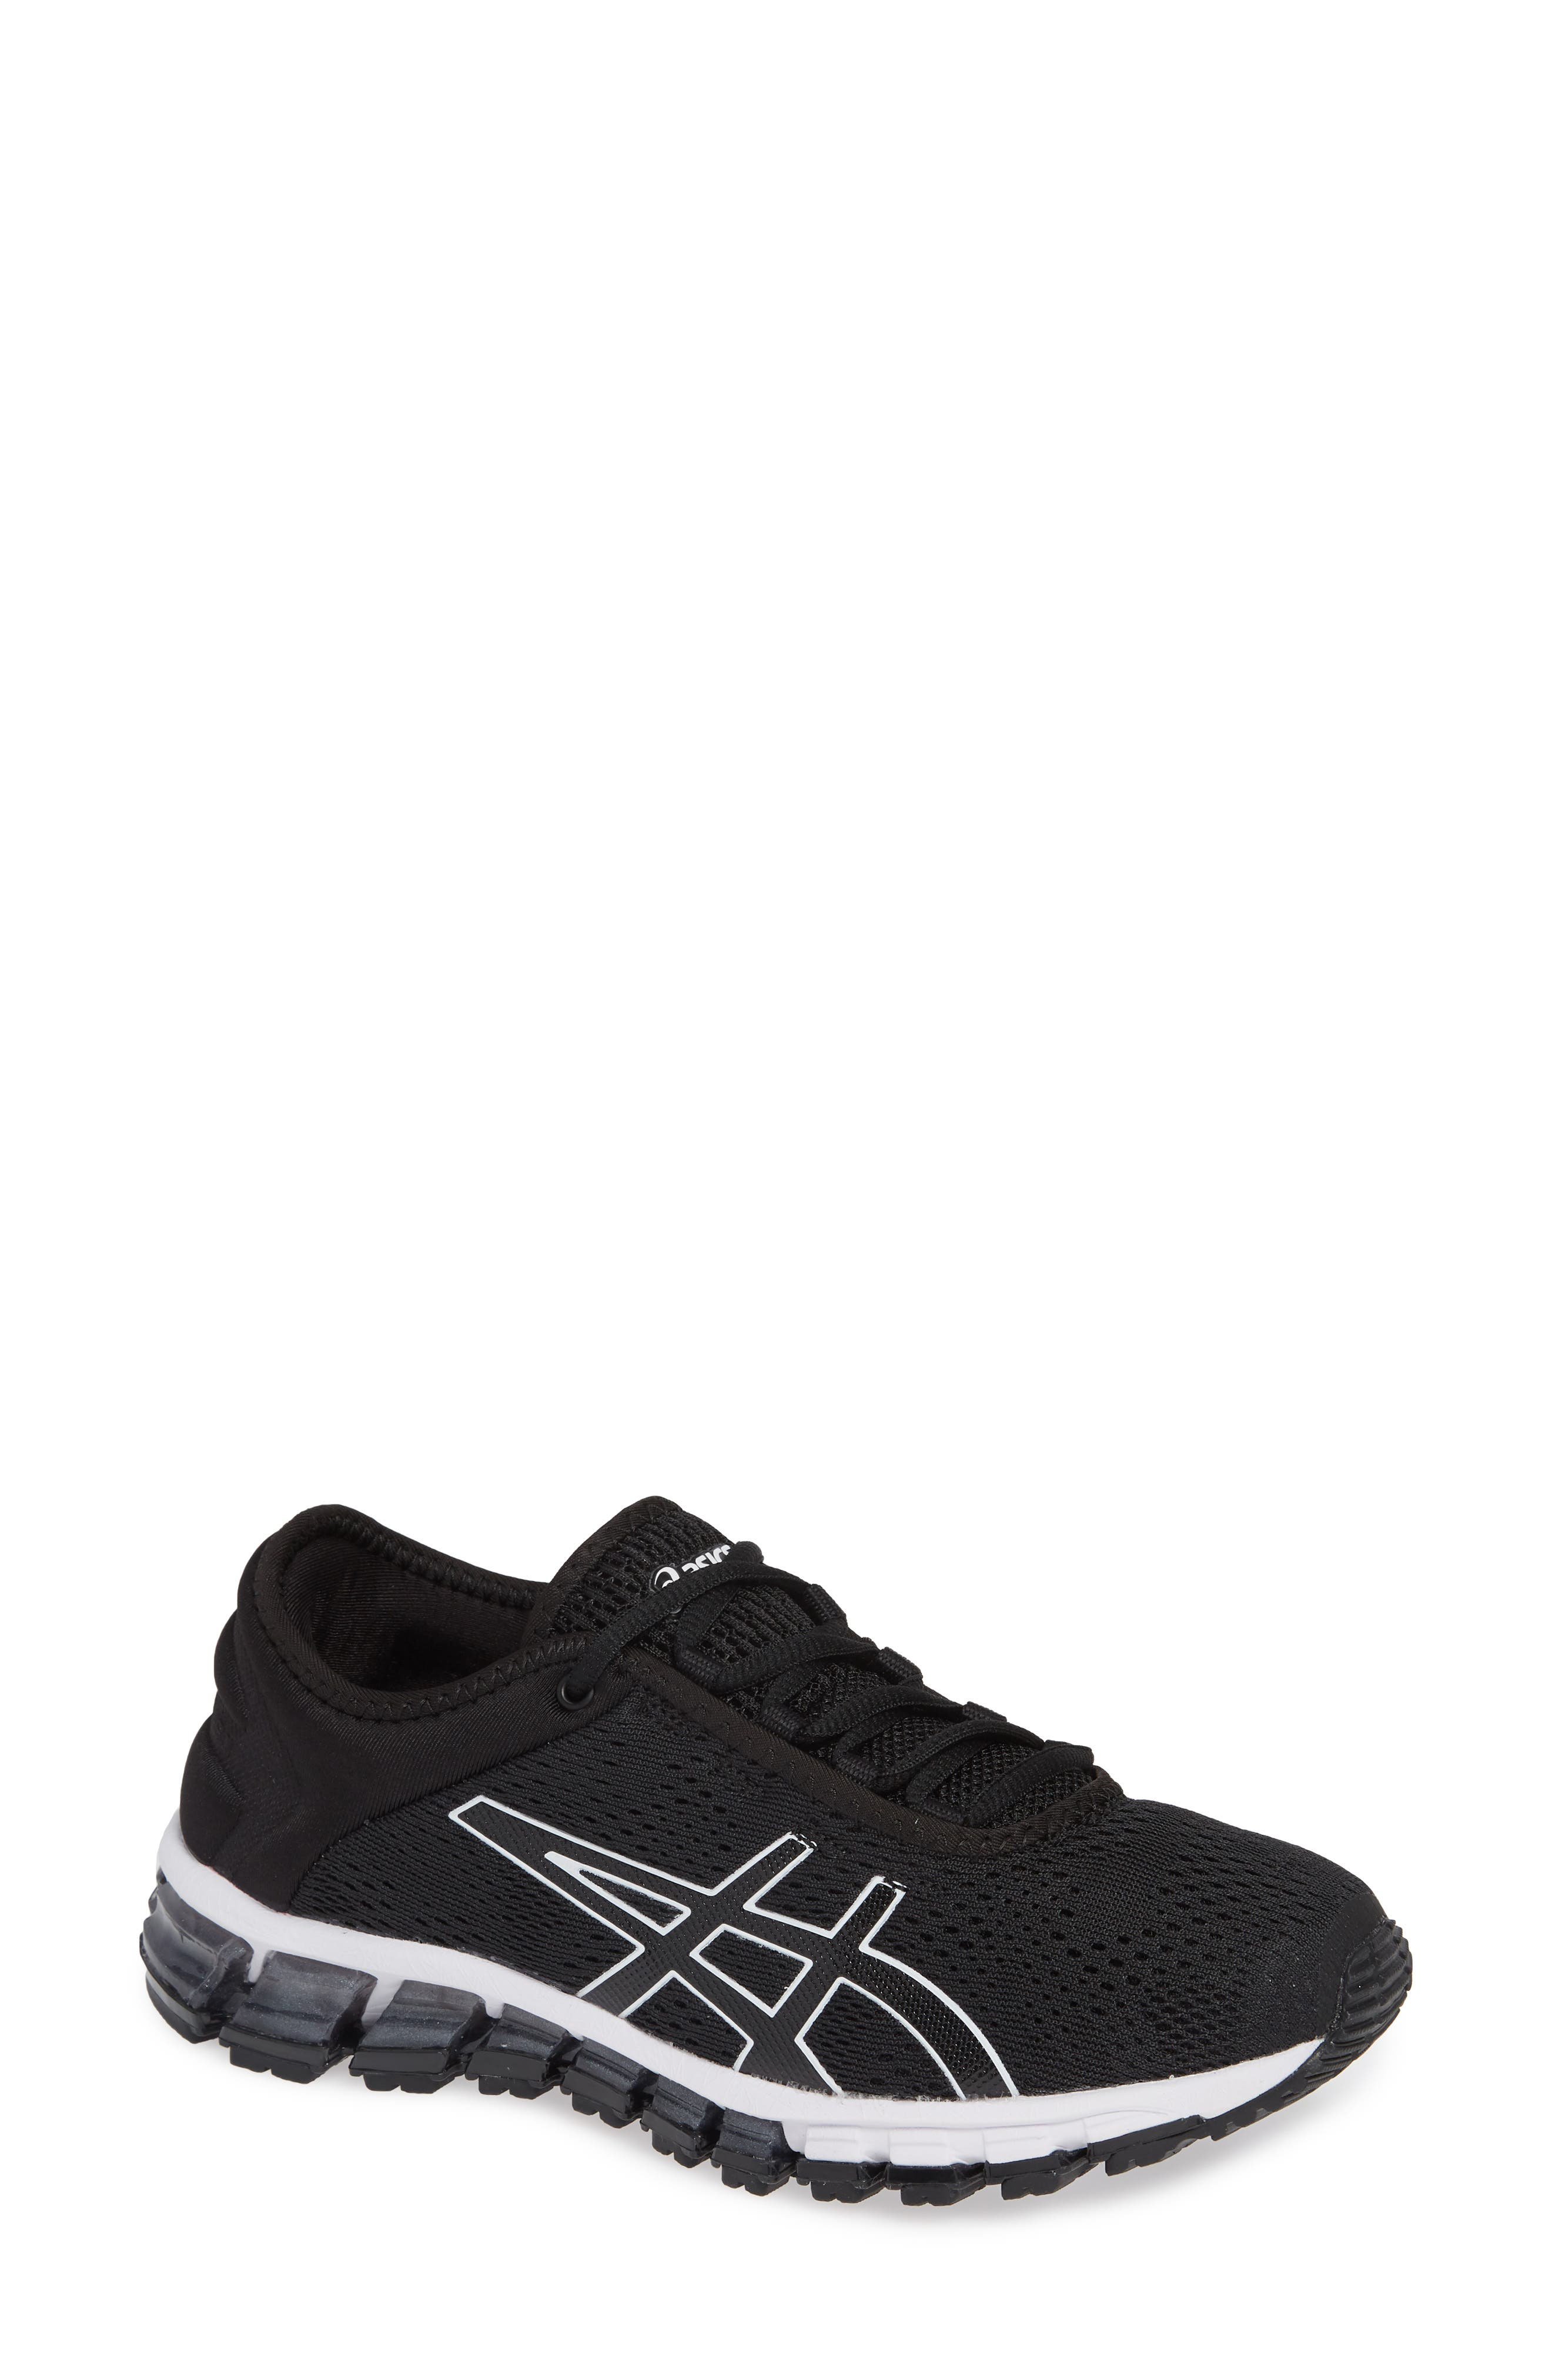 GEL Quantum 180 3 Running Shoe,                             Main thumbnail 1, color,                             BLACK/ WHITE